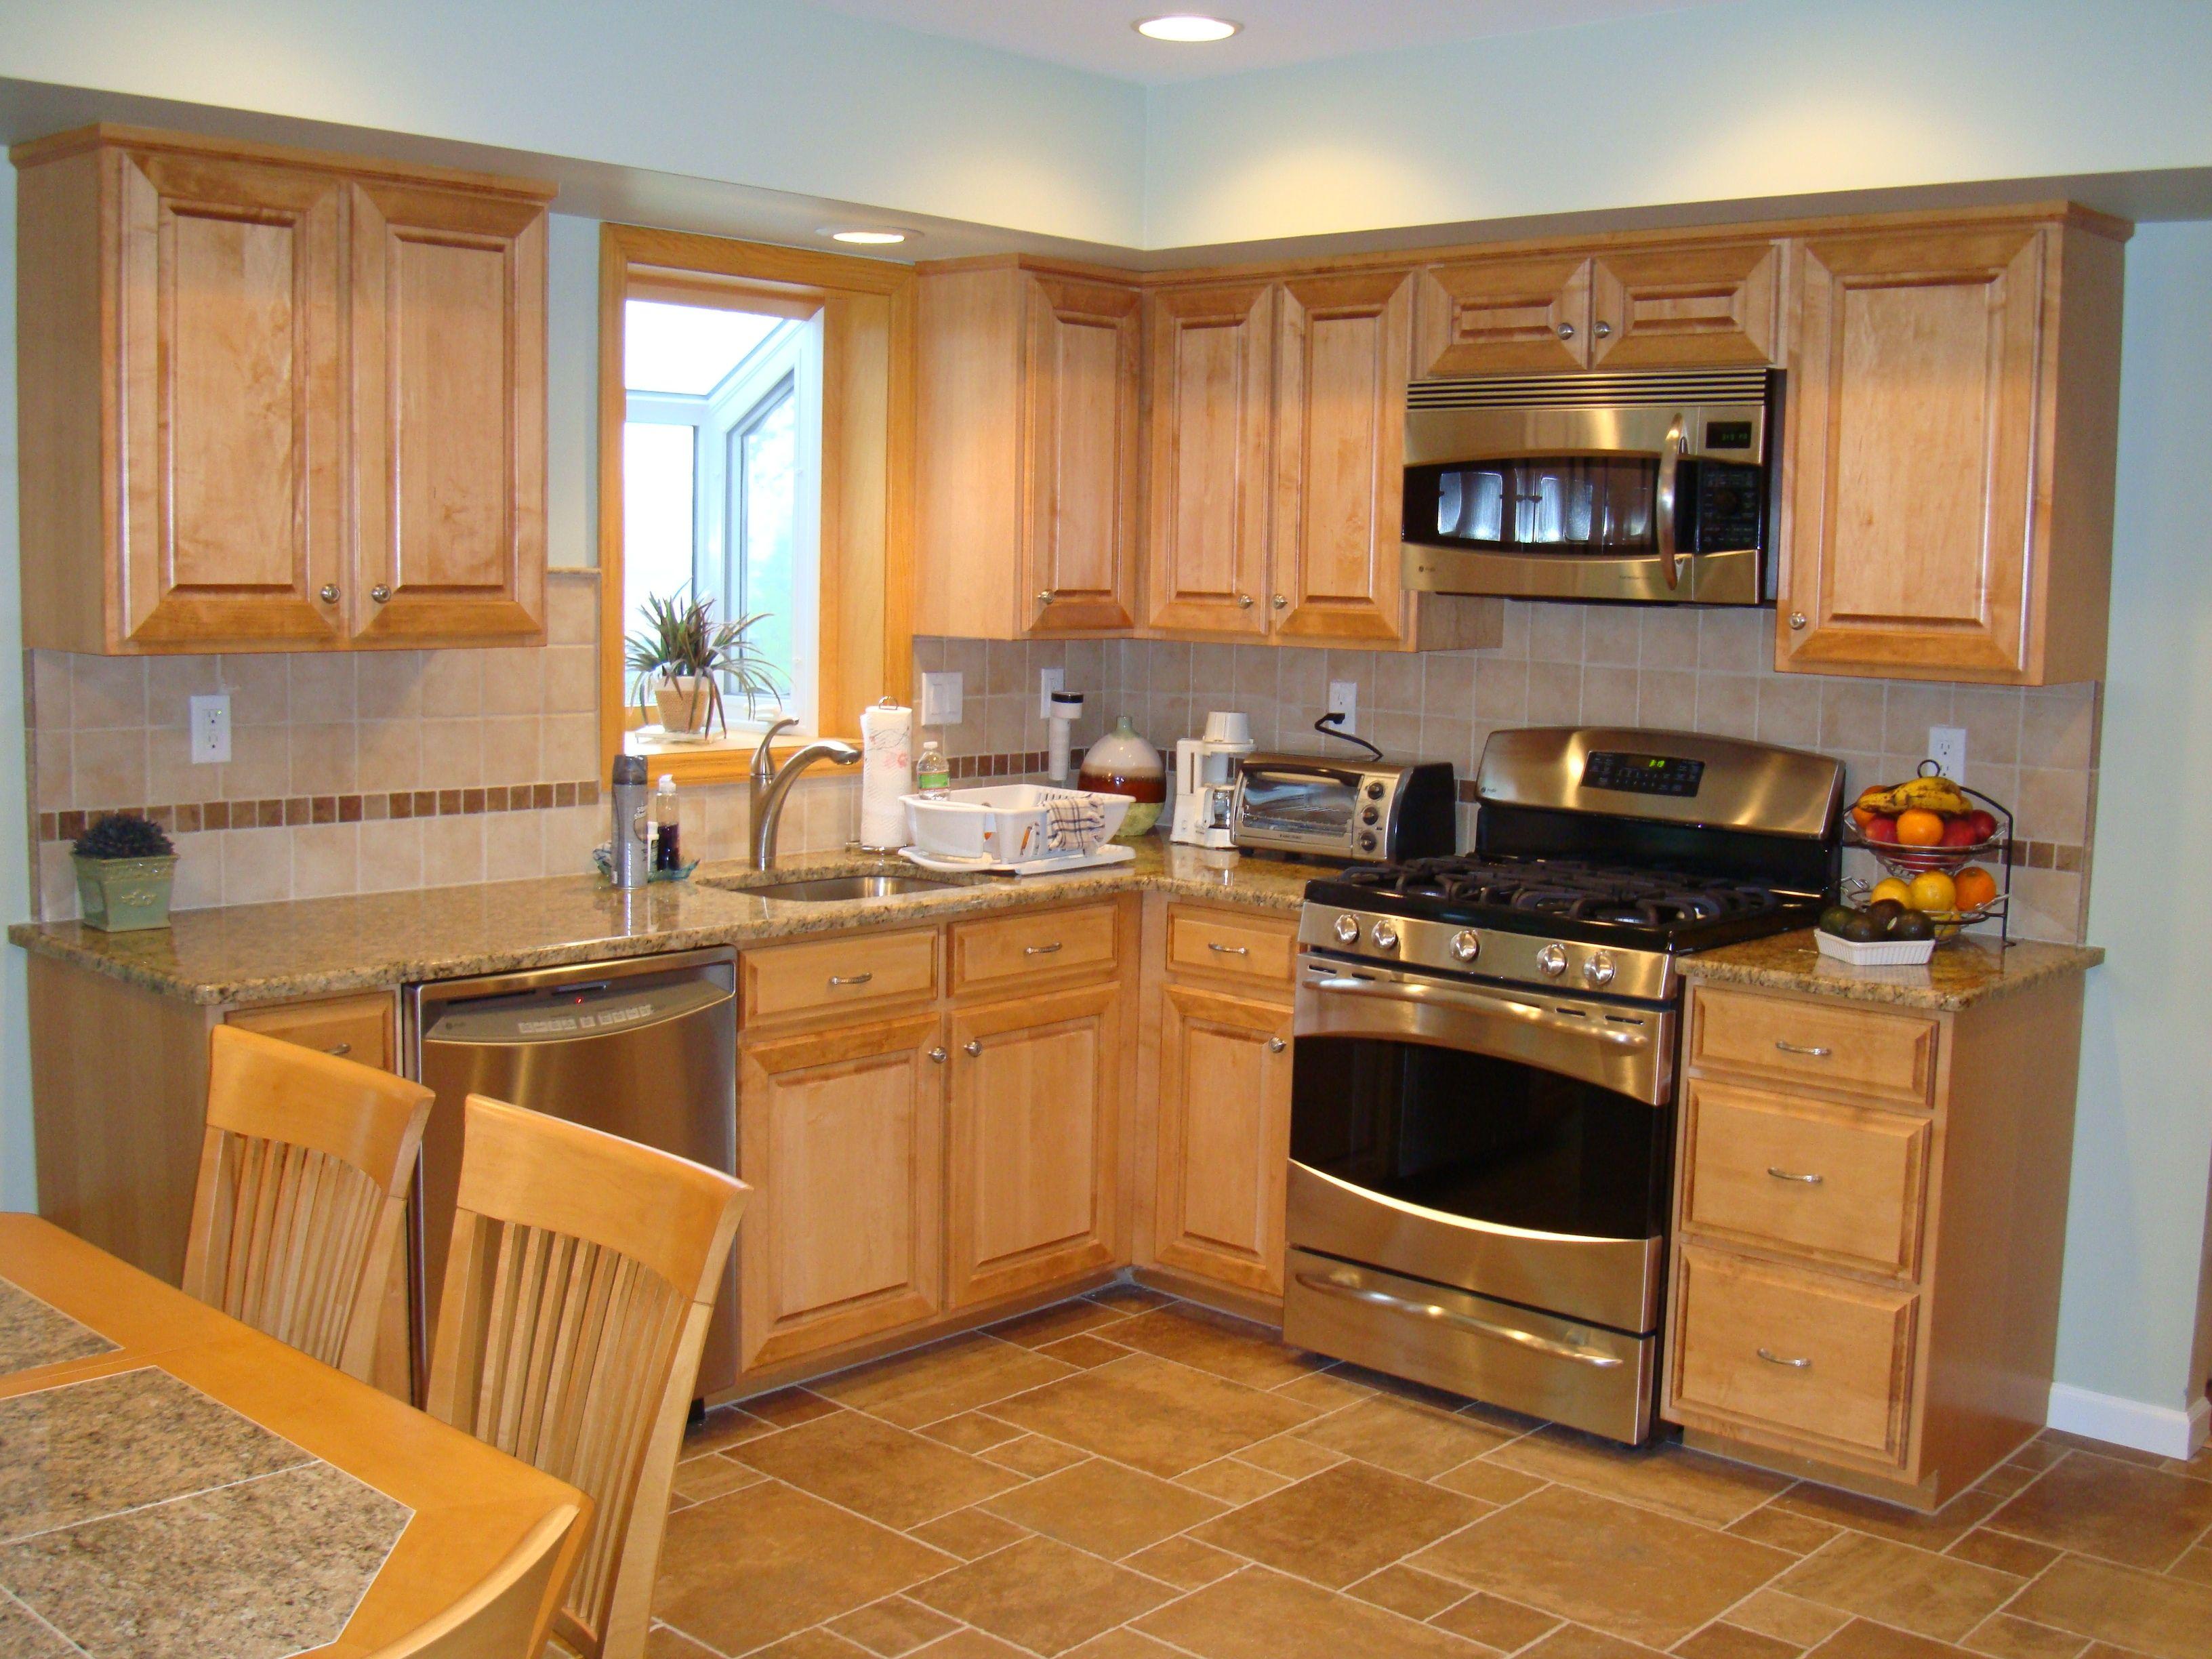 Best Conestoga Cabinet Color Kitchen Remodeling Contractors 640 x 480